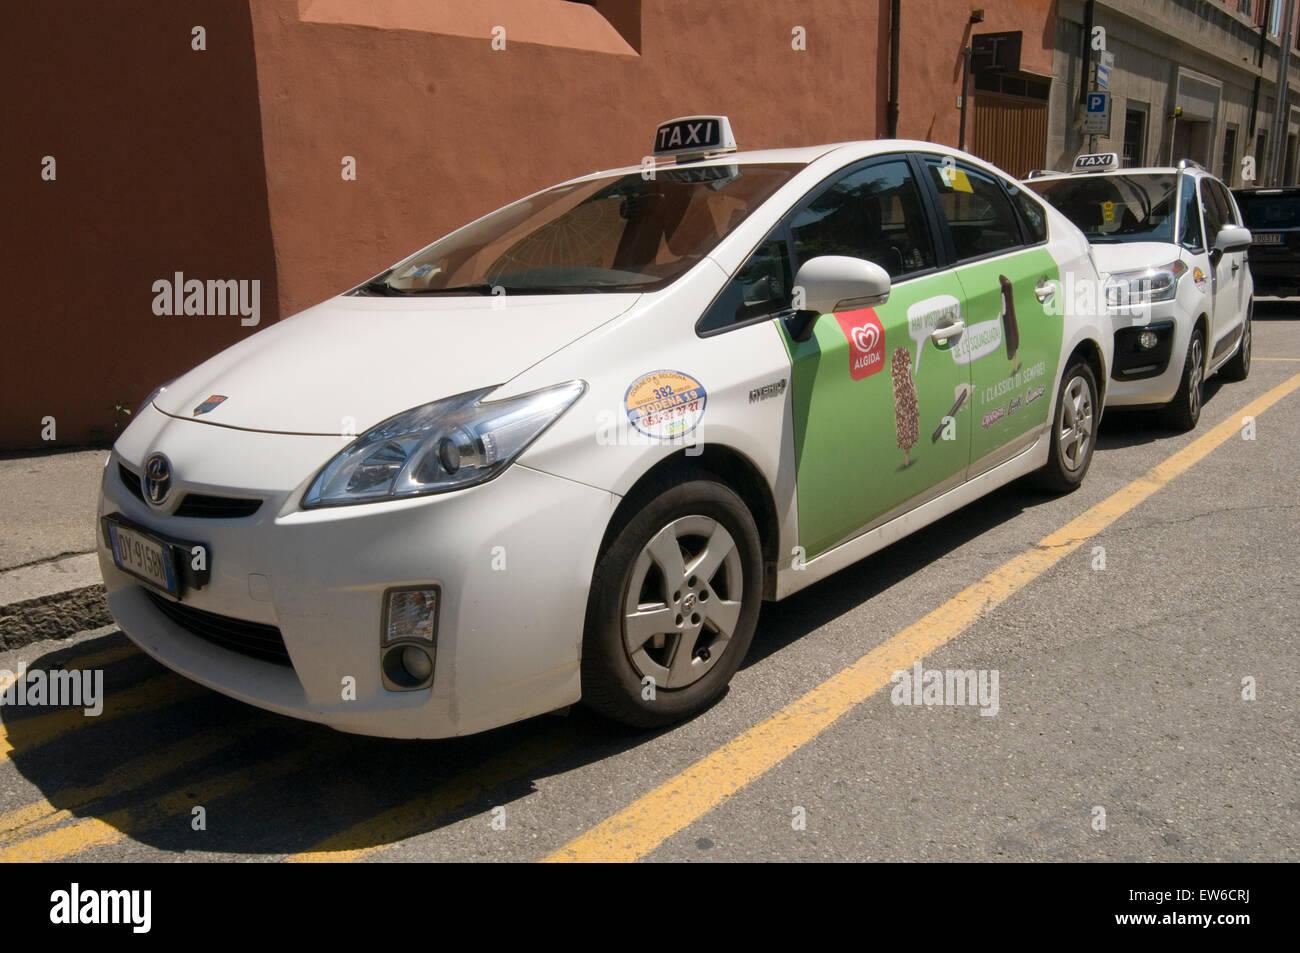 prius pirus toyota hybrid hybred car cars taxi Japanese - Stock Image